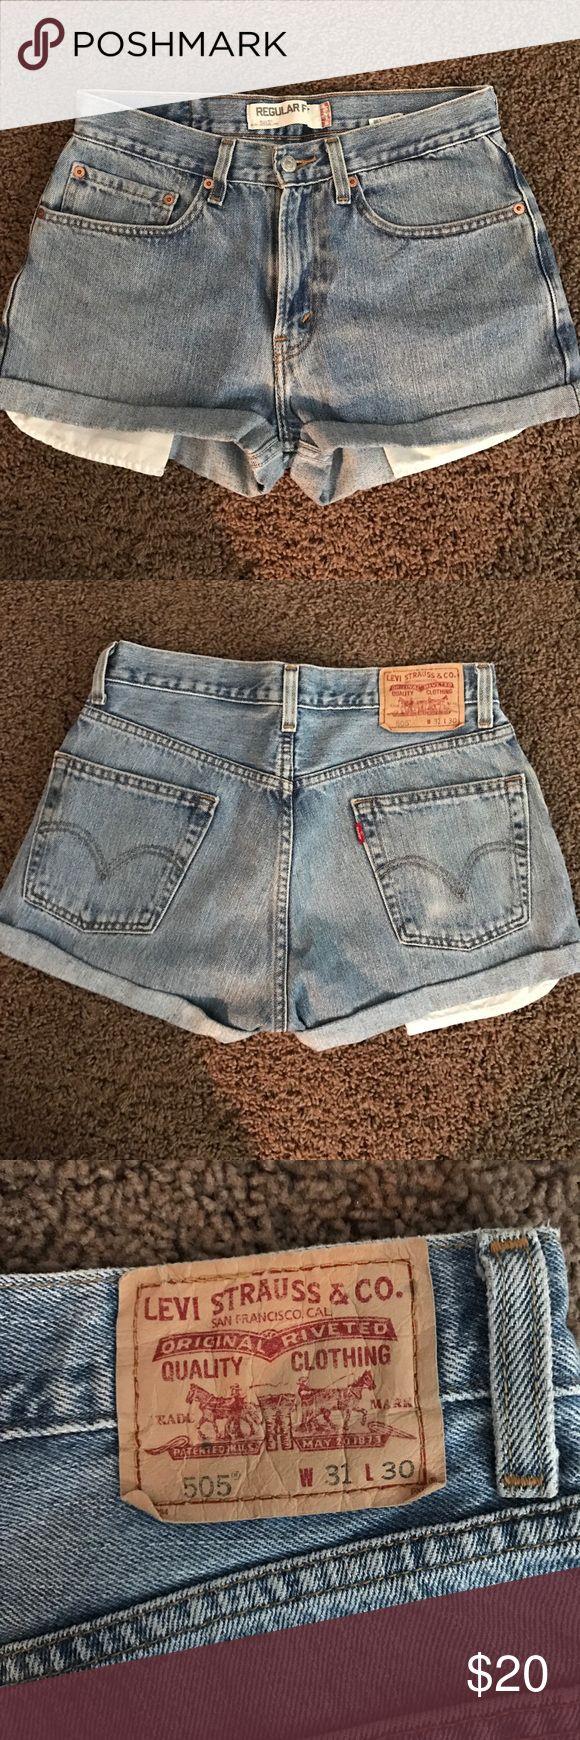 Vintage Levi regular fit 505 jean shorts Levi 505 jean shorts // regular fit // w31 l30 // worn once // runs small Levi's Shorts Jean Shorts